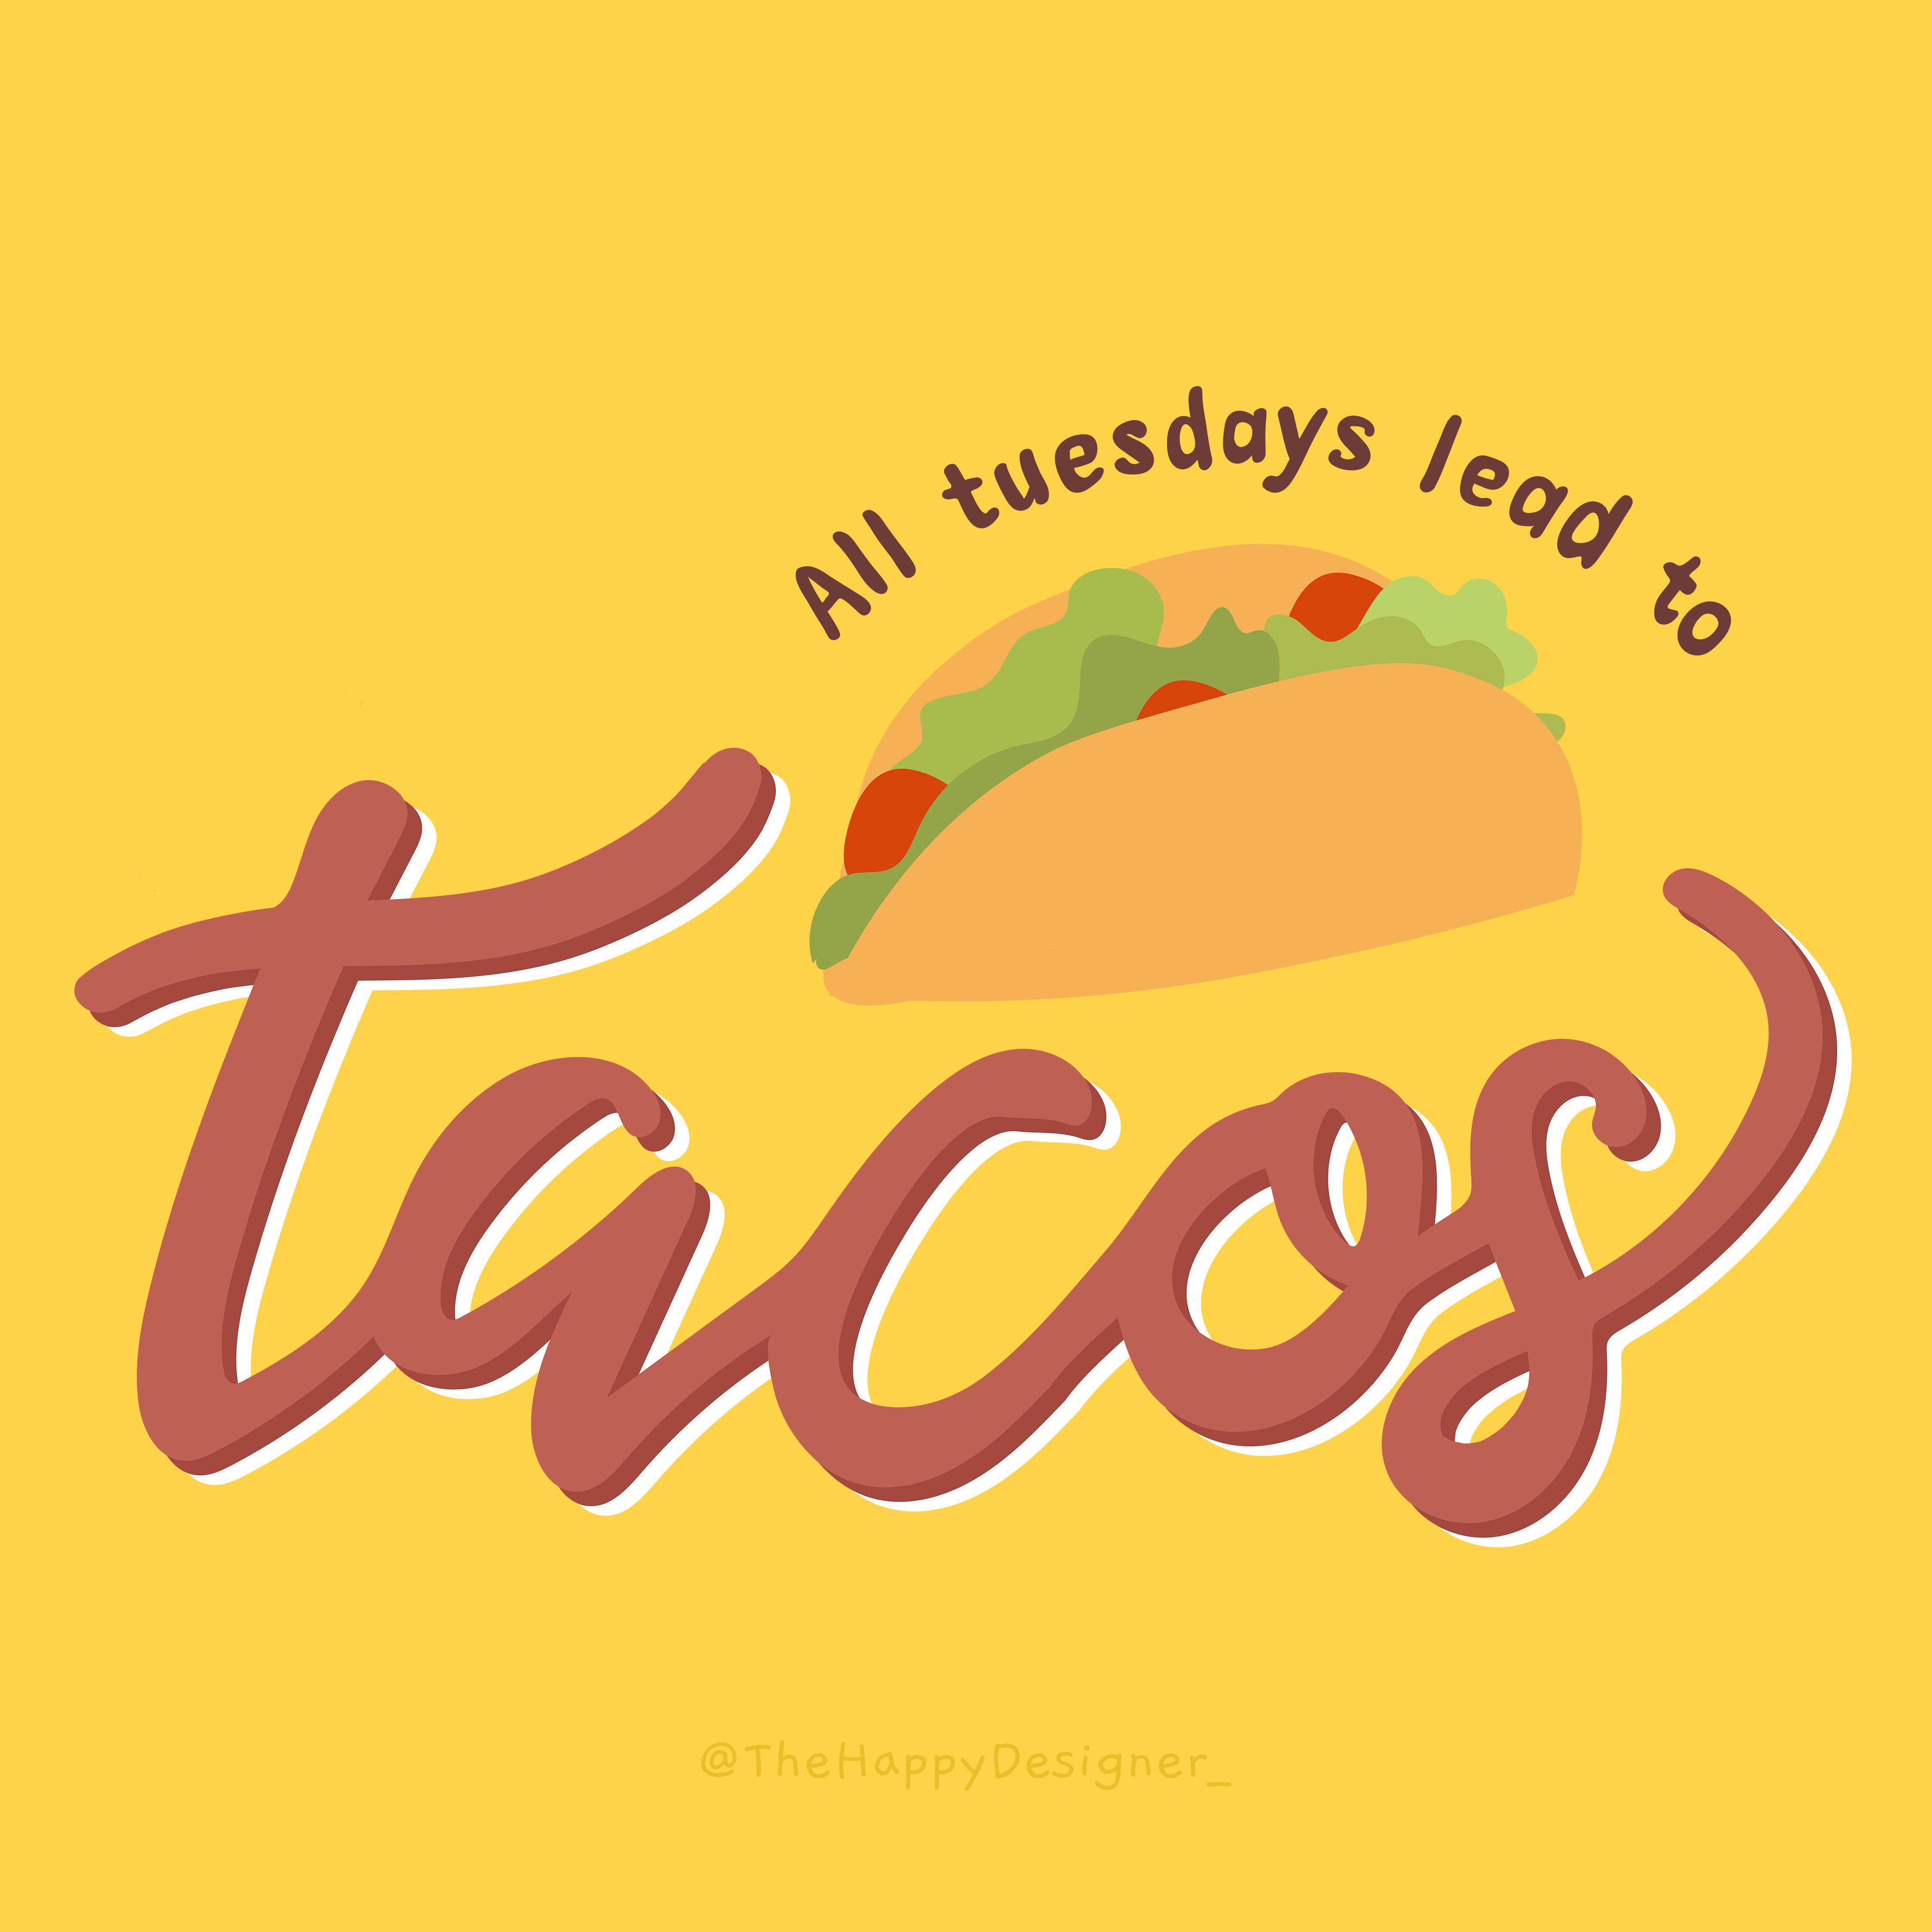 Tuesday Tacos In 2021 Taco Tuesdays Funny Taco Humor Tuesday Humor